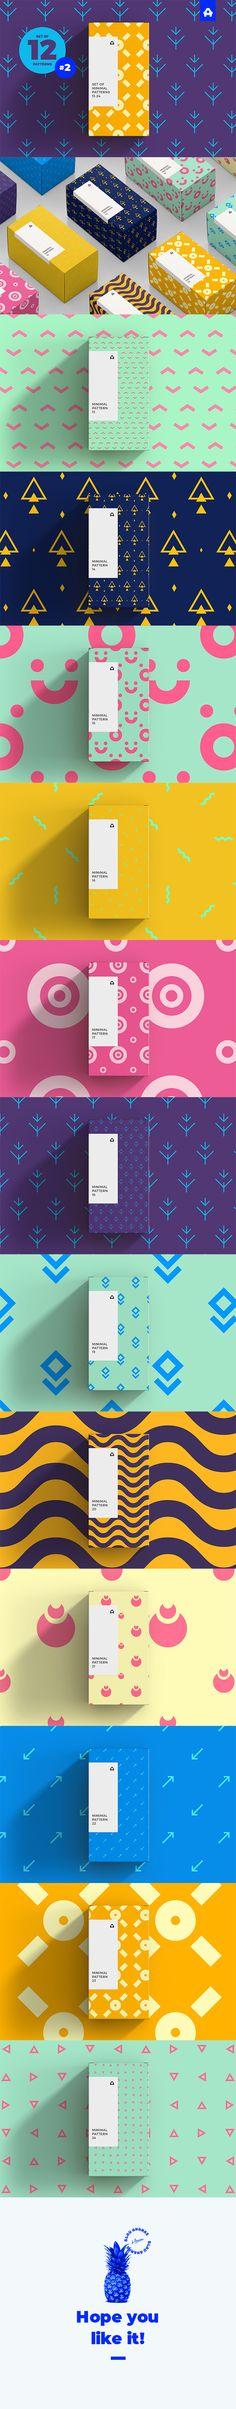 Set of Minimal Patterns vol 2 #funny #background Download : https://graphicriver.net/item/set-of-minimal-patterns-vol-2/21464118?ref=pxcr